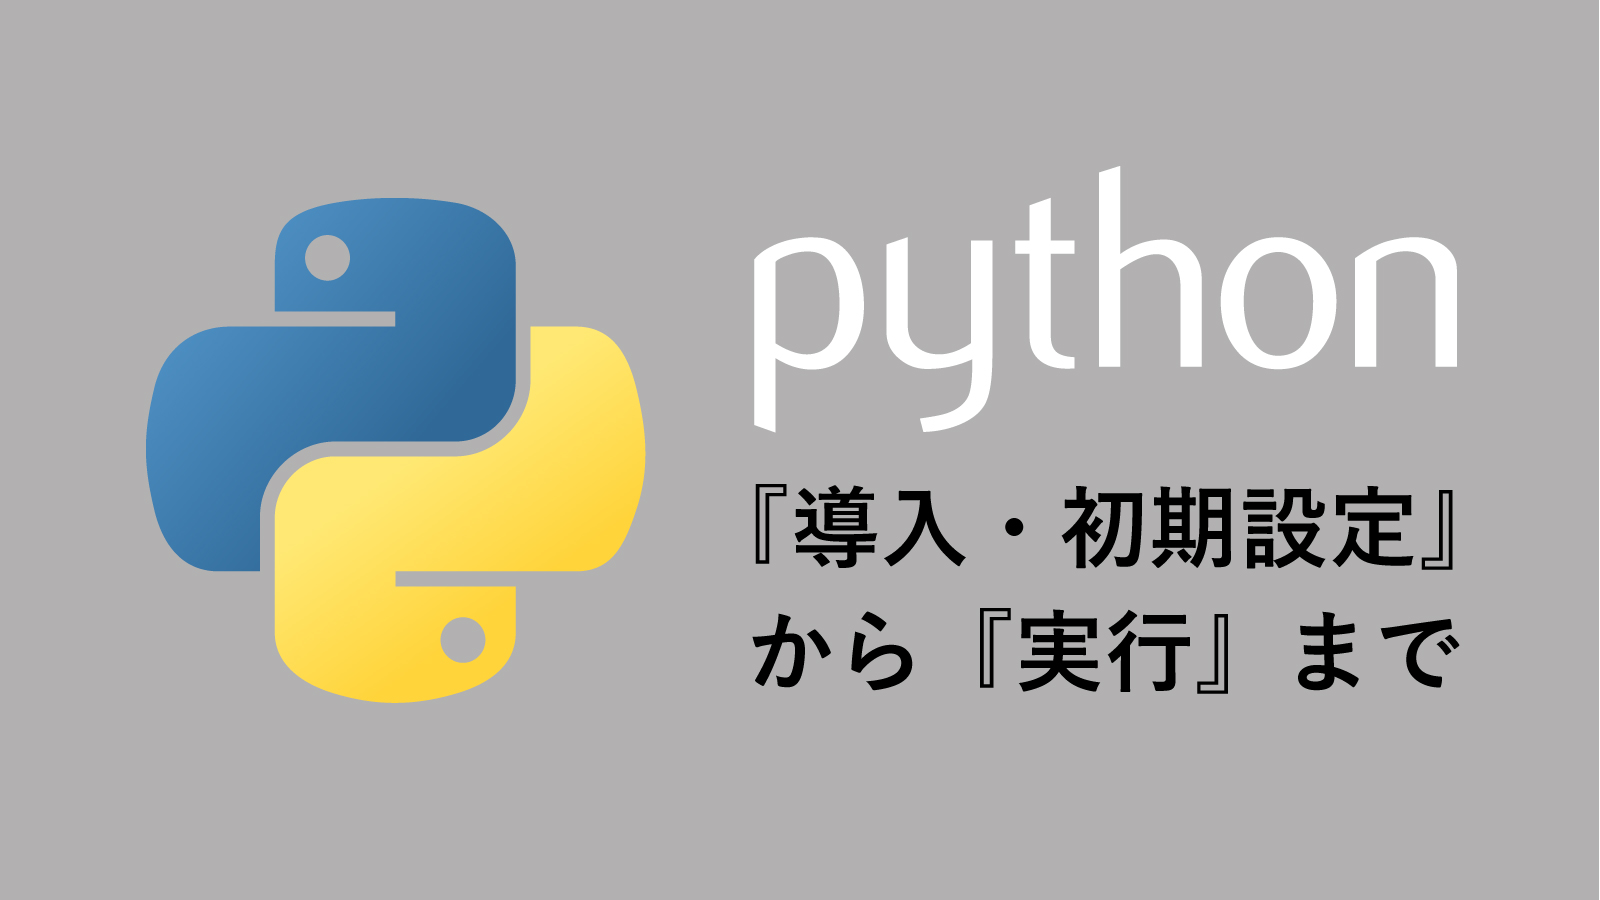 [Mac]未経験者向け!Pythonの『導入・初期設定』から『実行』まで紹介